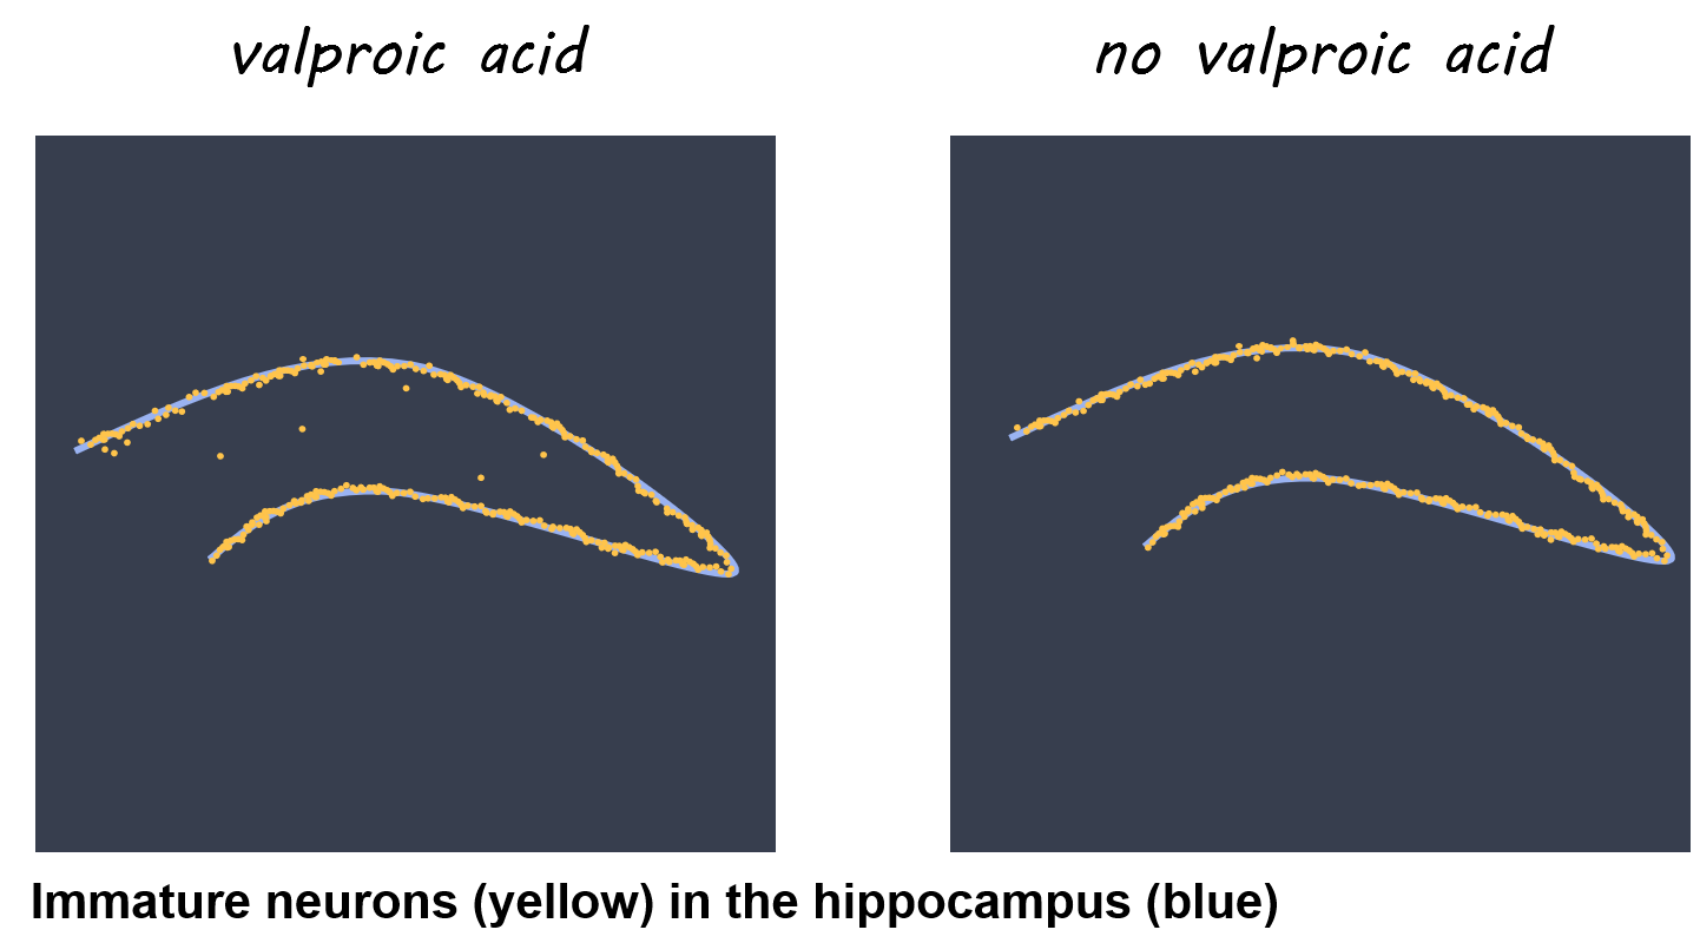 Artistic rendering of Figure 1c